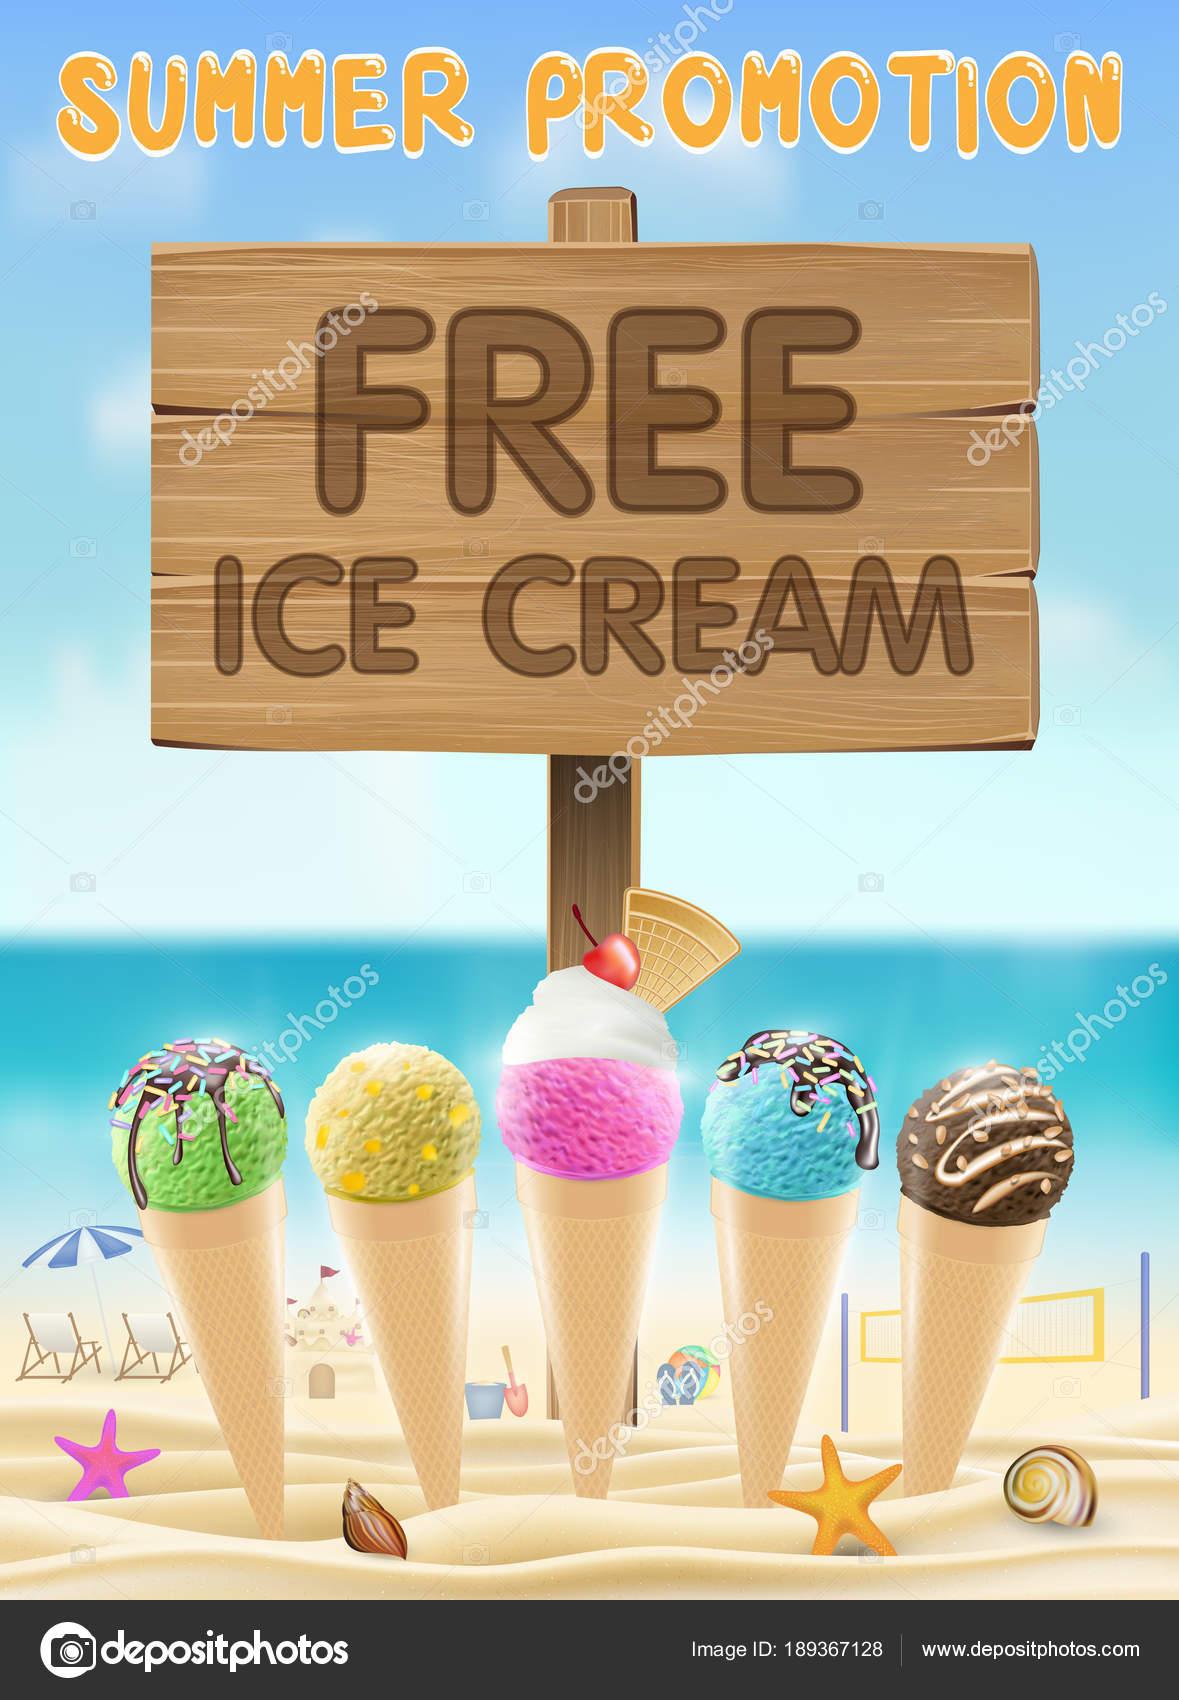 free ice cream wood